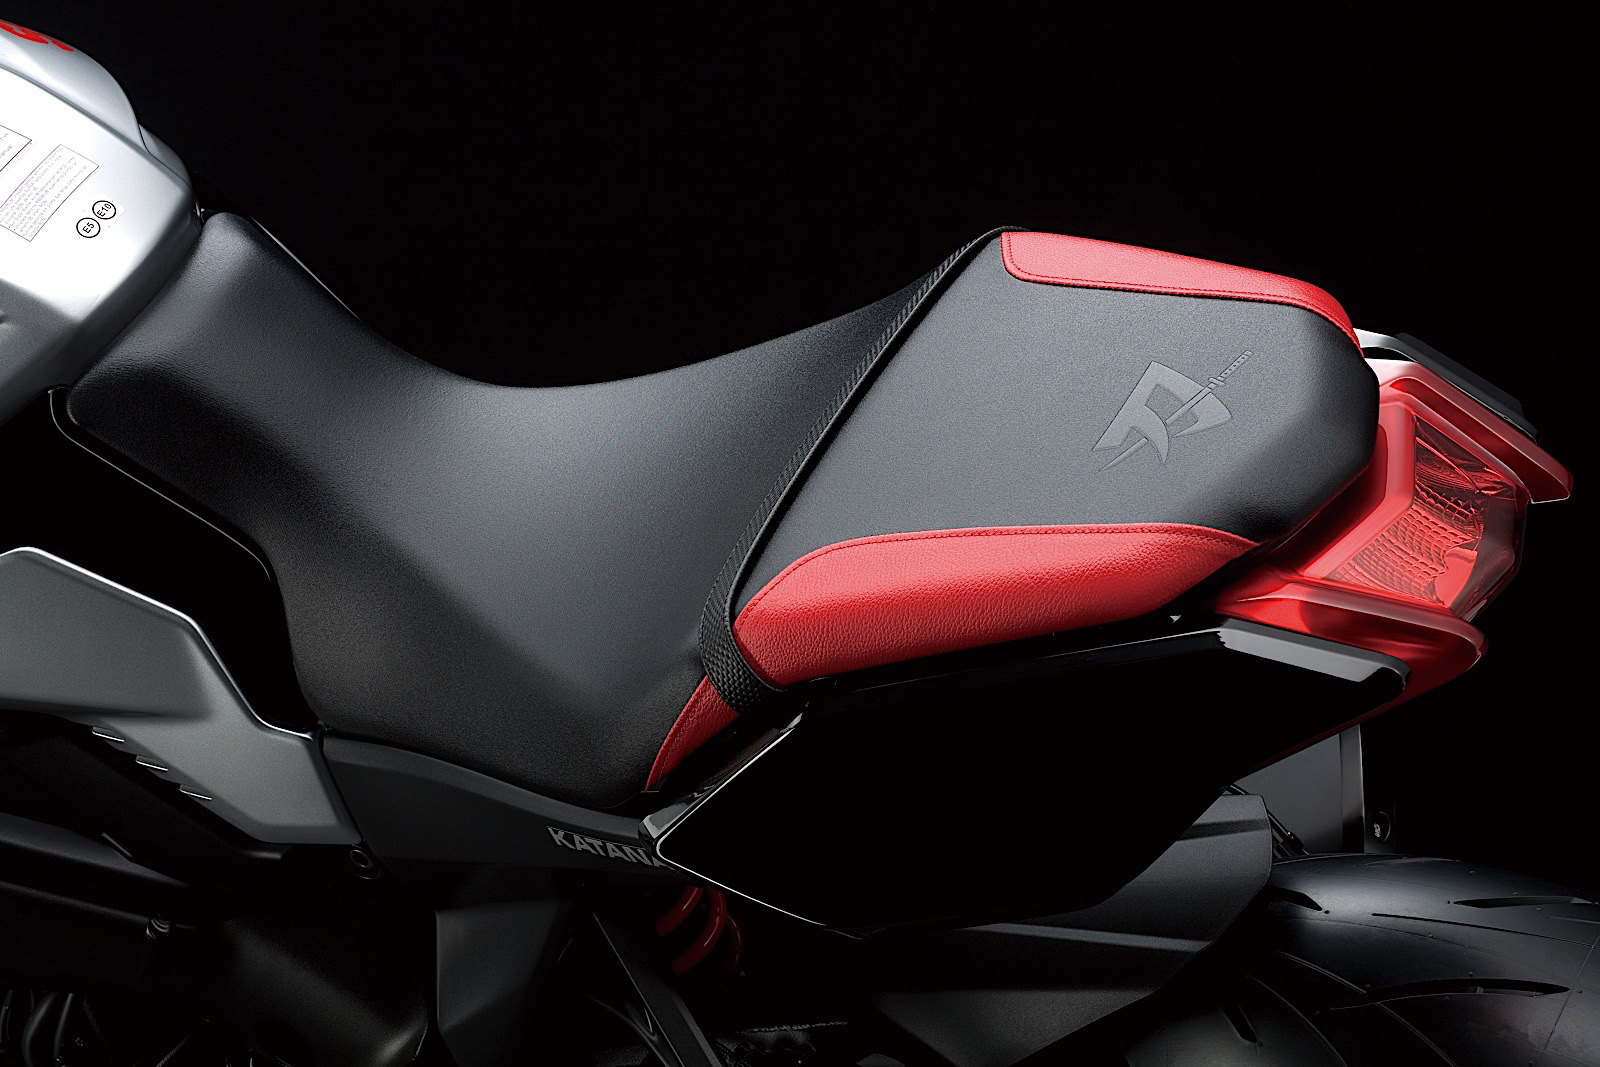 katana-m0-colored-seat